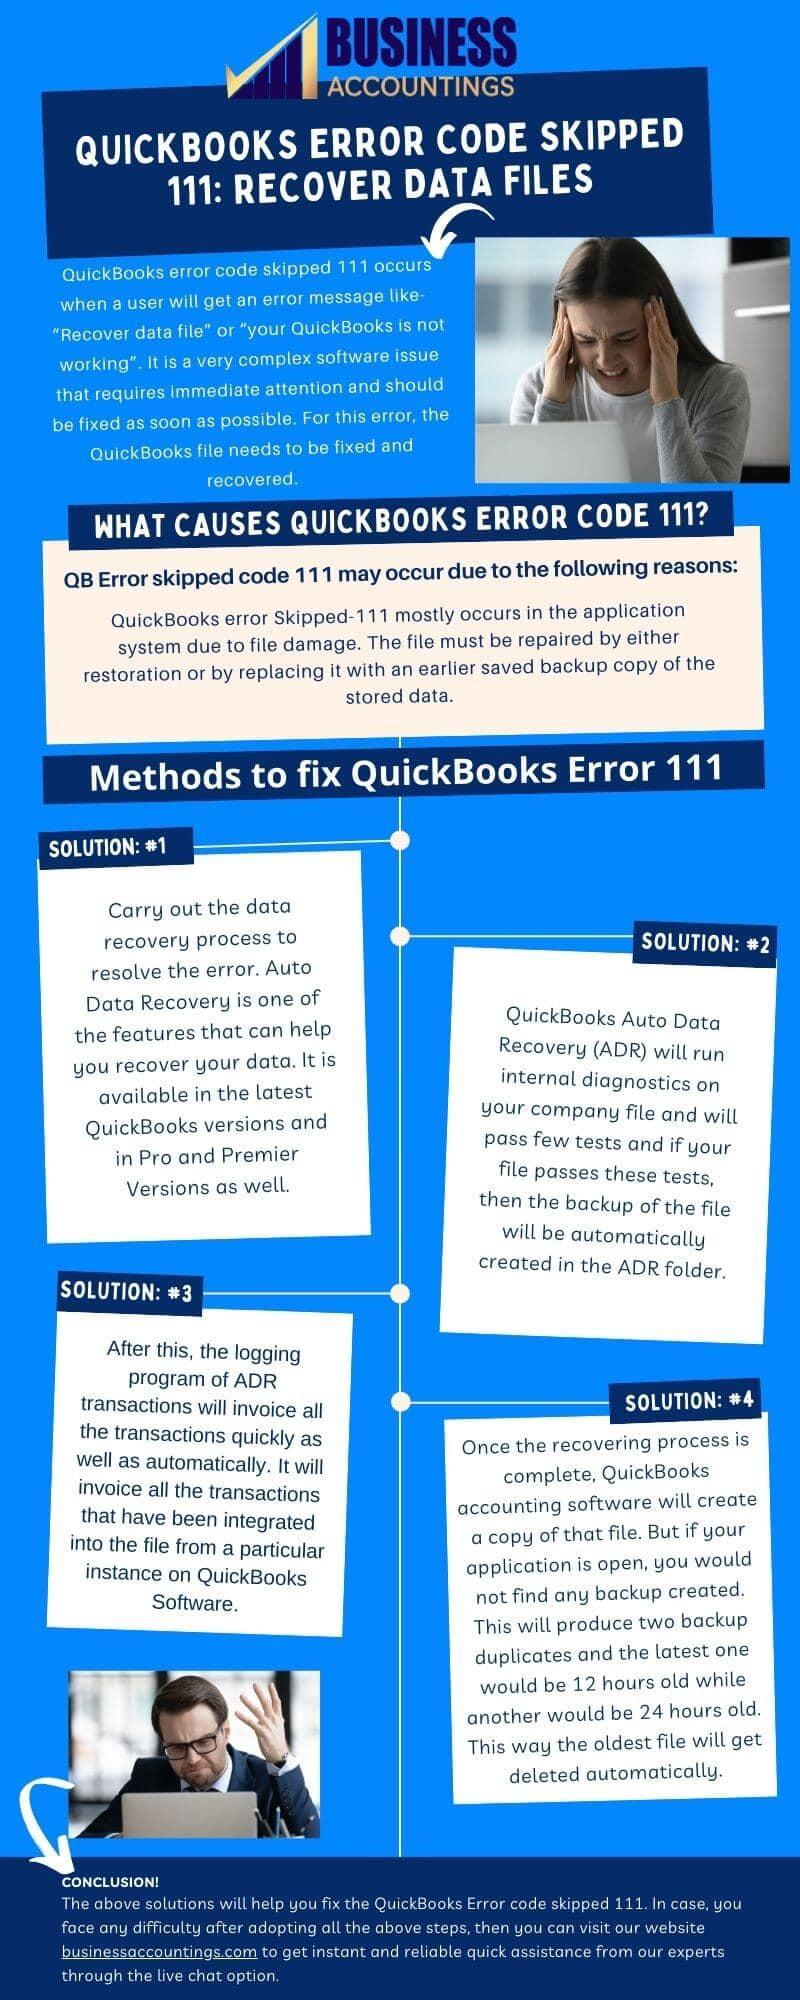 Infographic to Fix The QuickBooks Error Code Skipped 111